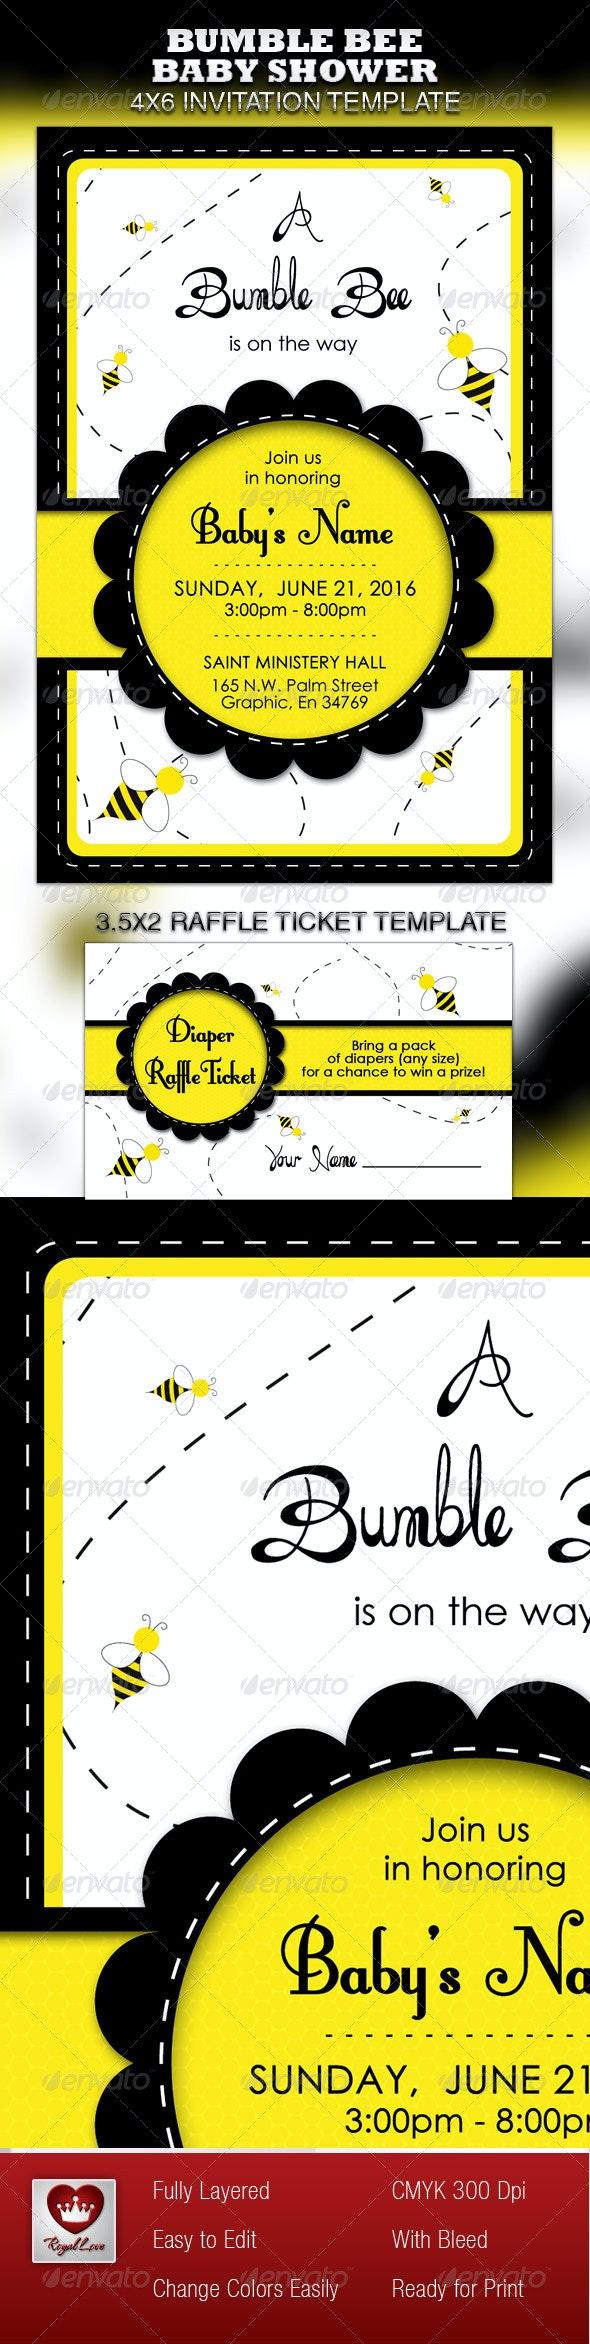 Bumble Bee Baby Shower Invitation & Raffle Ticket - Invitations Cards & Invites